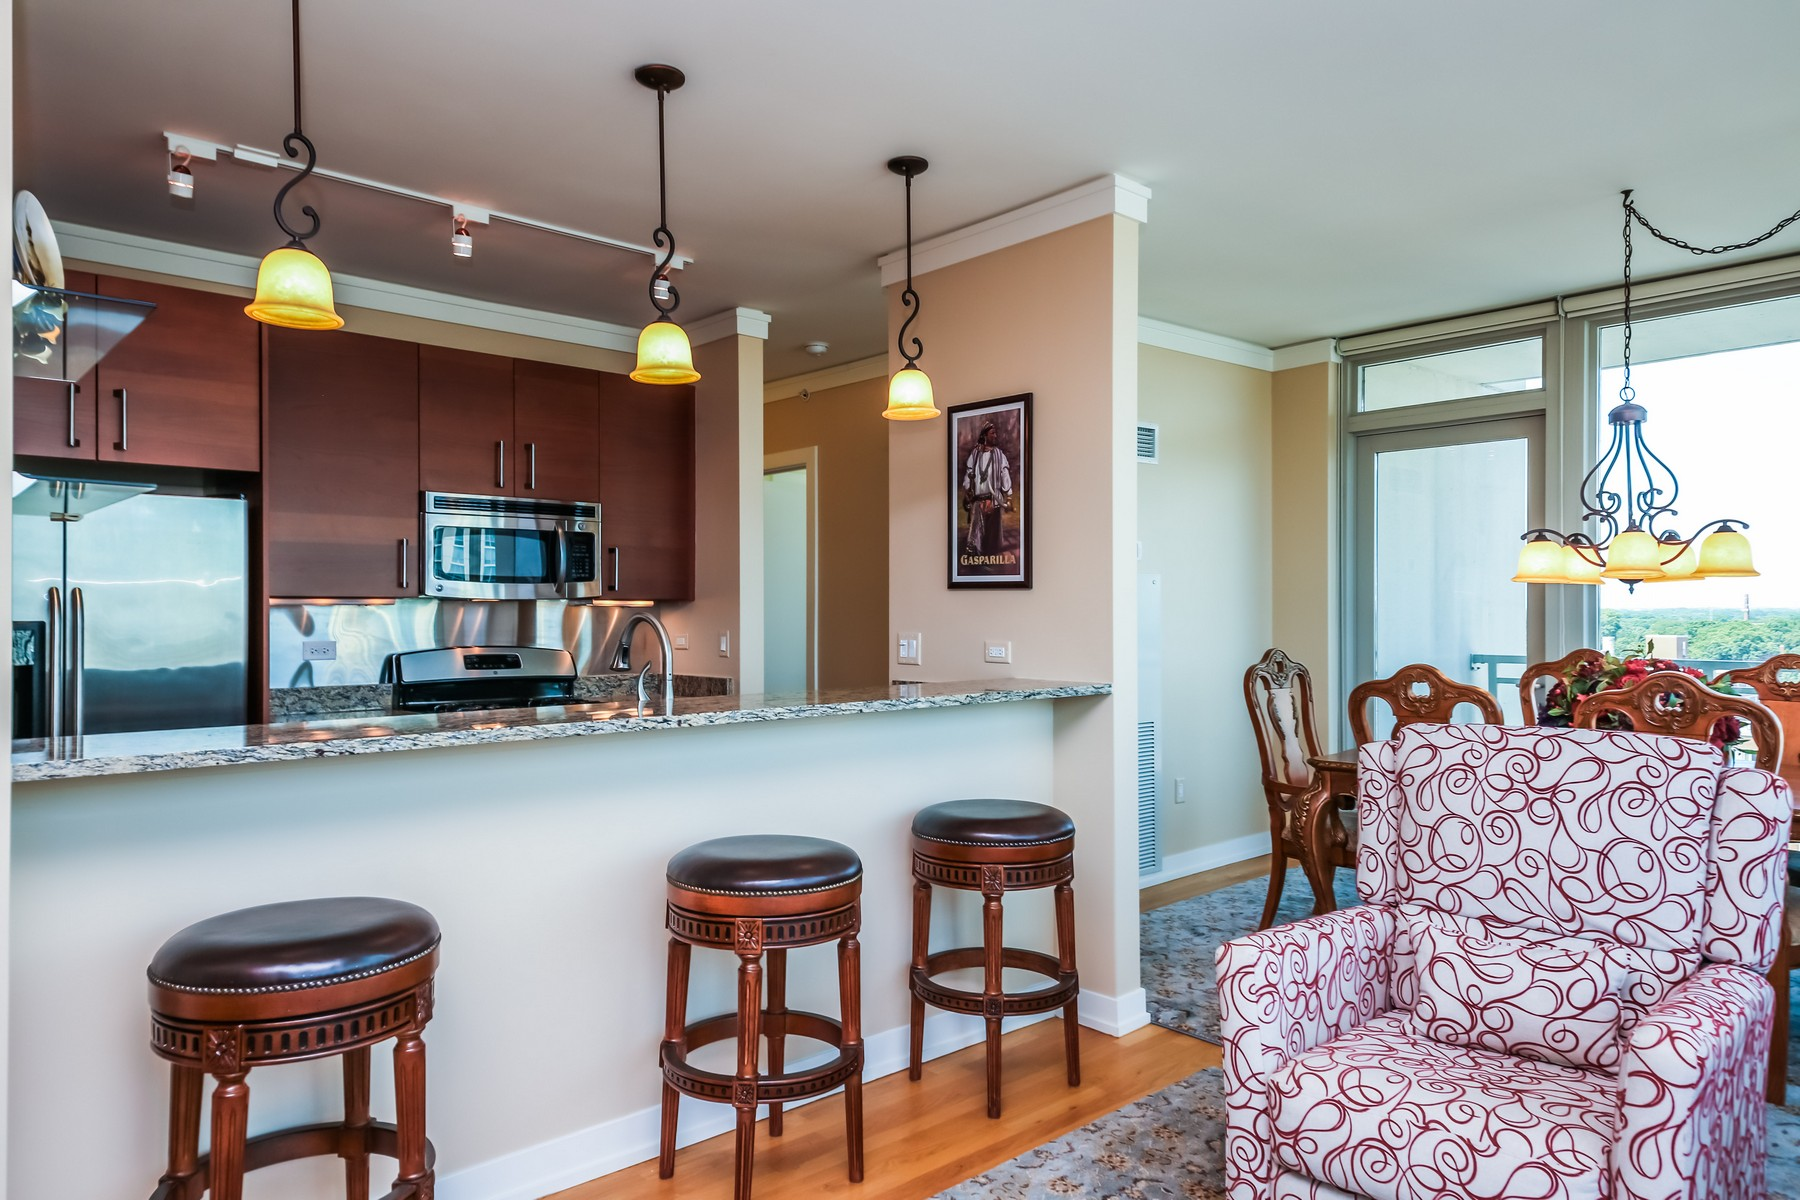 Additional photo for property listing at Wonderful Condo In Premier Evanston Building 1570 Elmwood Avenue Unit 1111 Evanston, Illinois 60201 United States